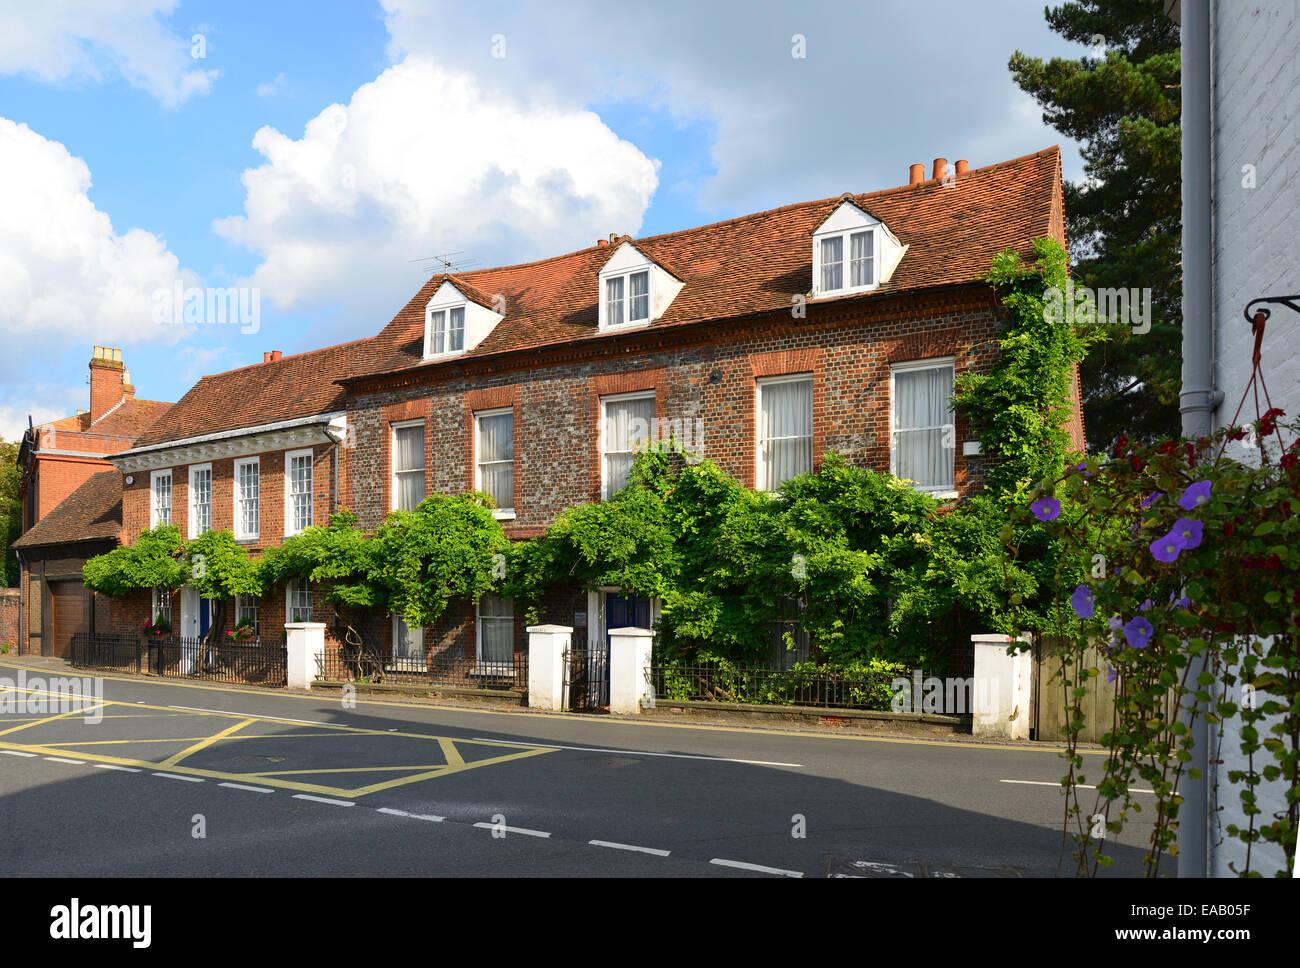 Eastgate cottages, Sutton Road, Cookham, Berkshire, England, United Kingdom - Stock Image